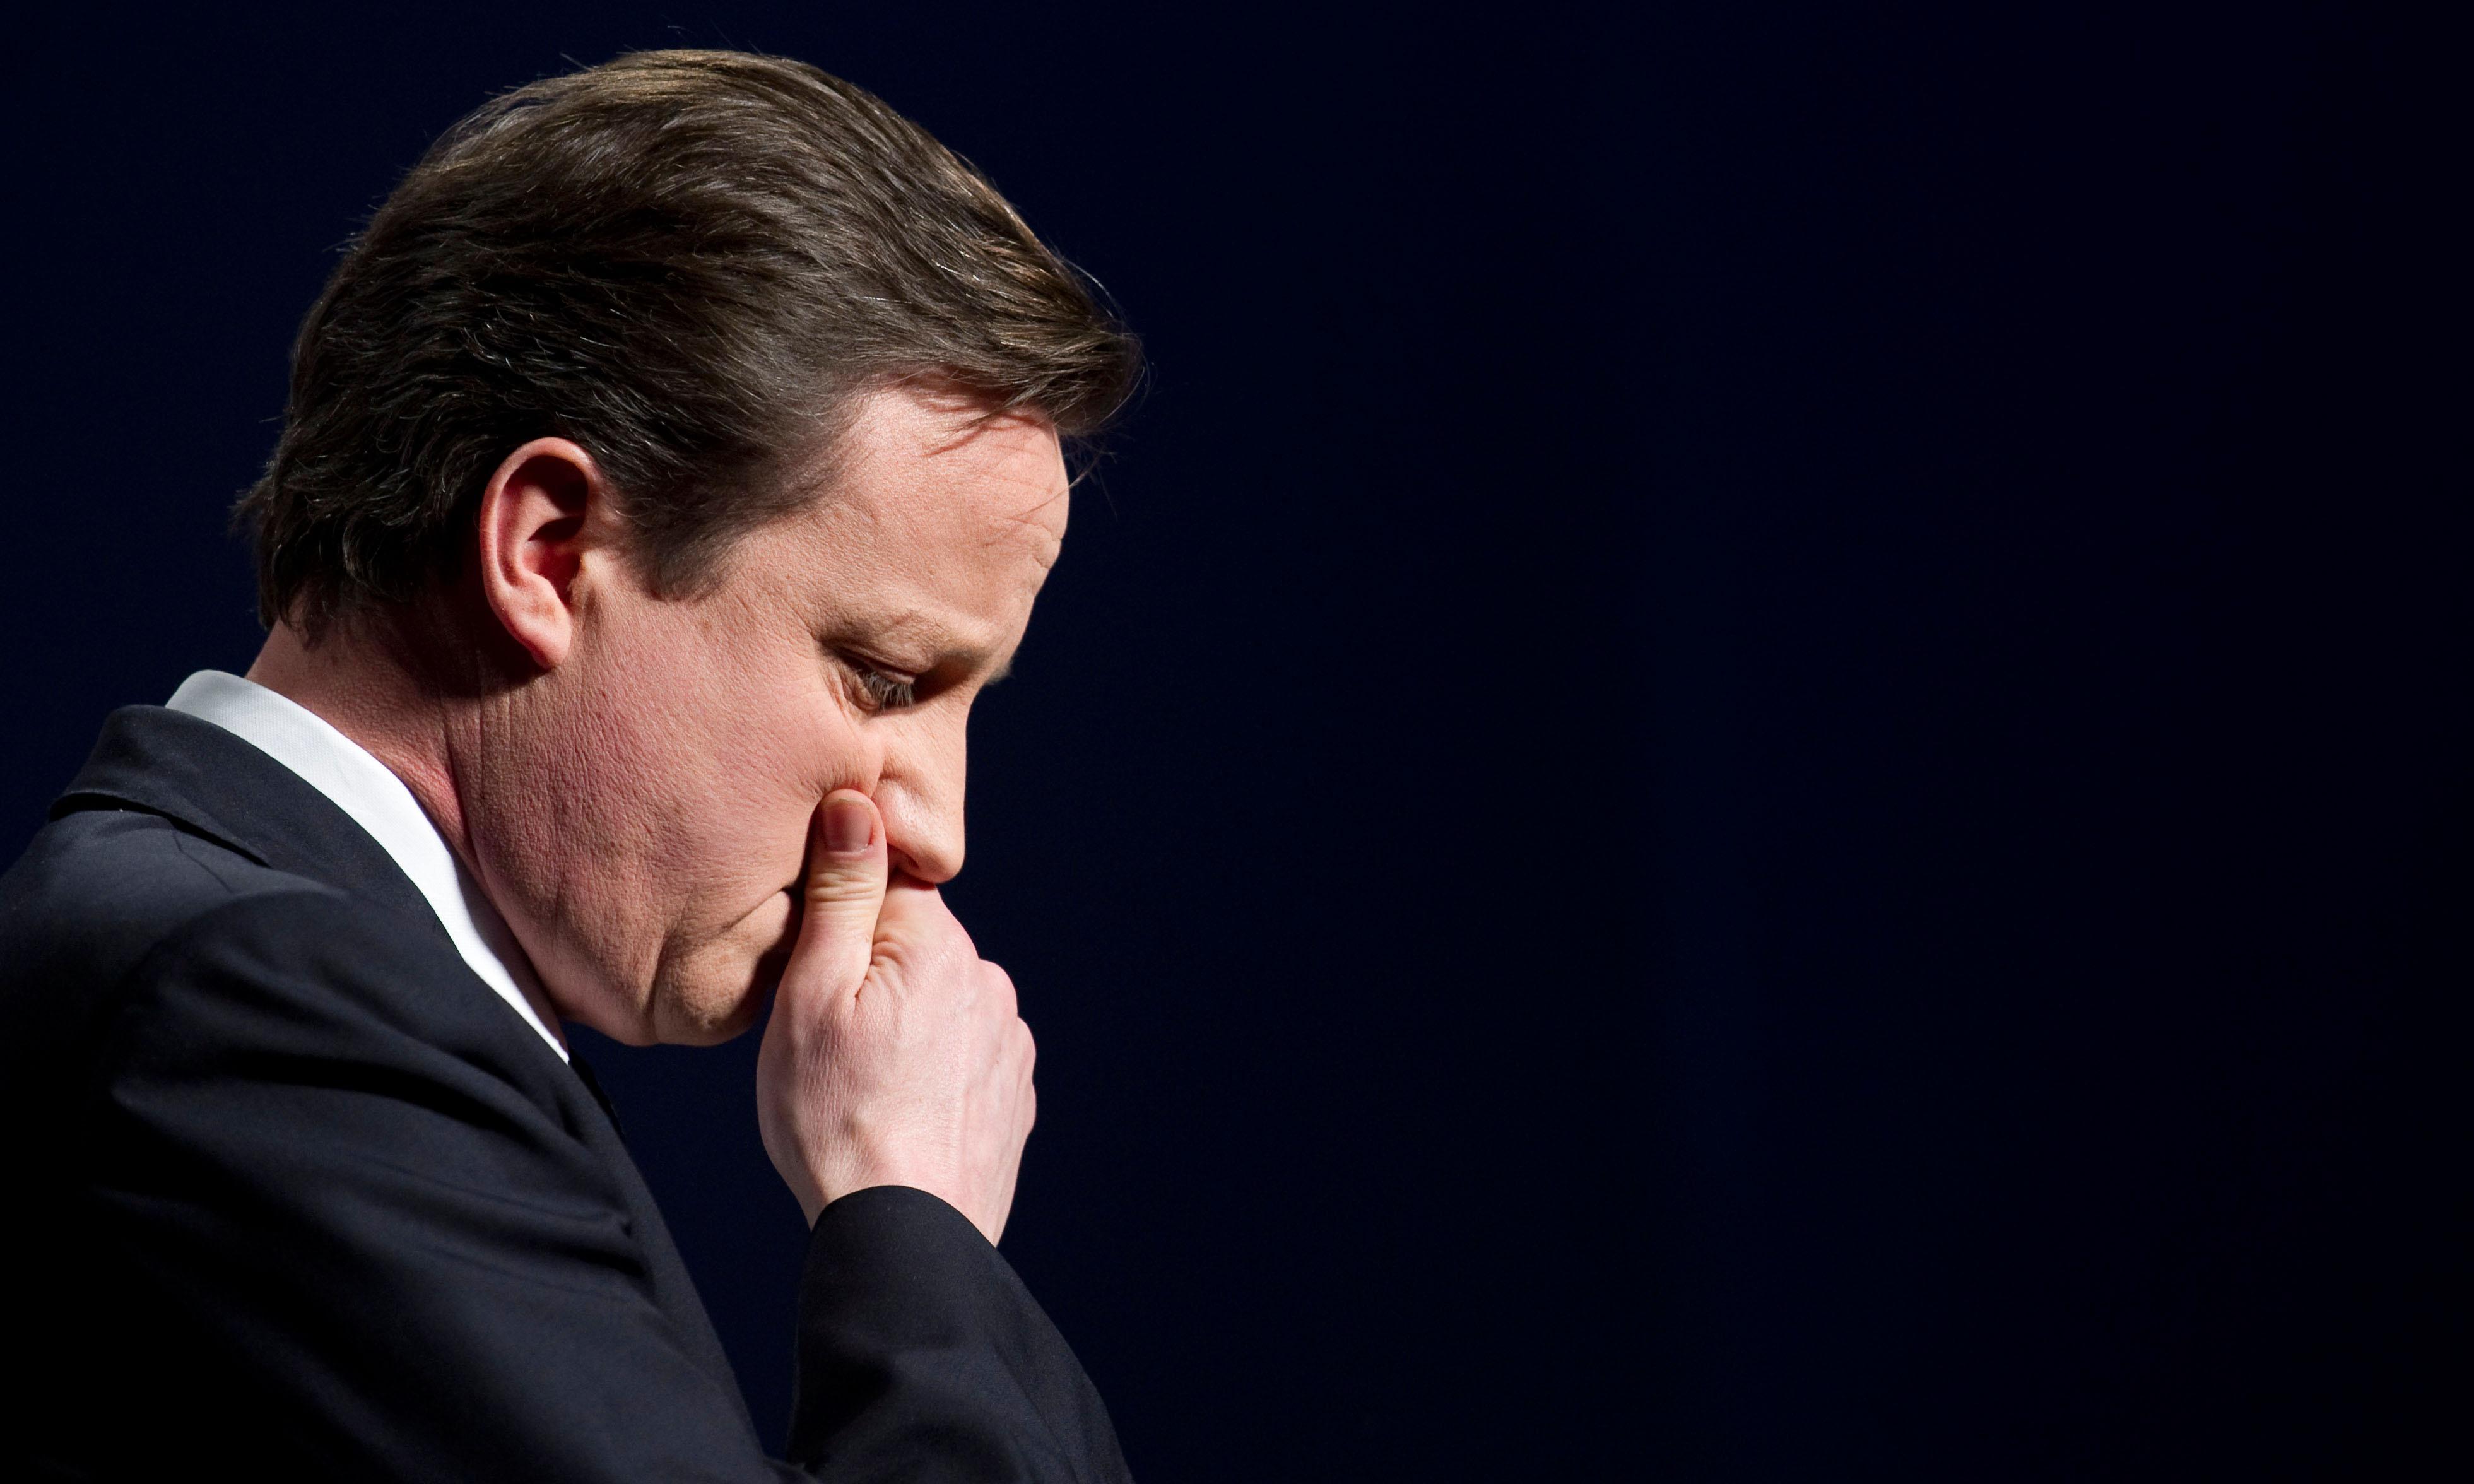 The Guardian view on David Cameron's memoirs